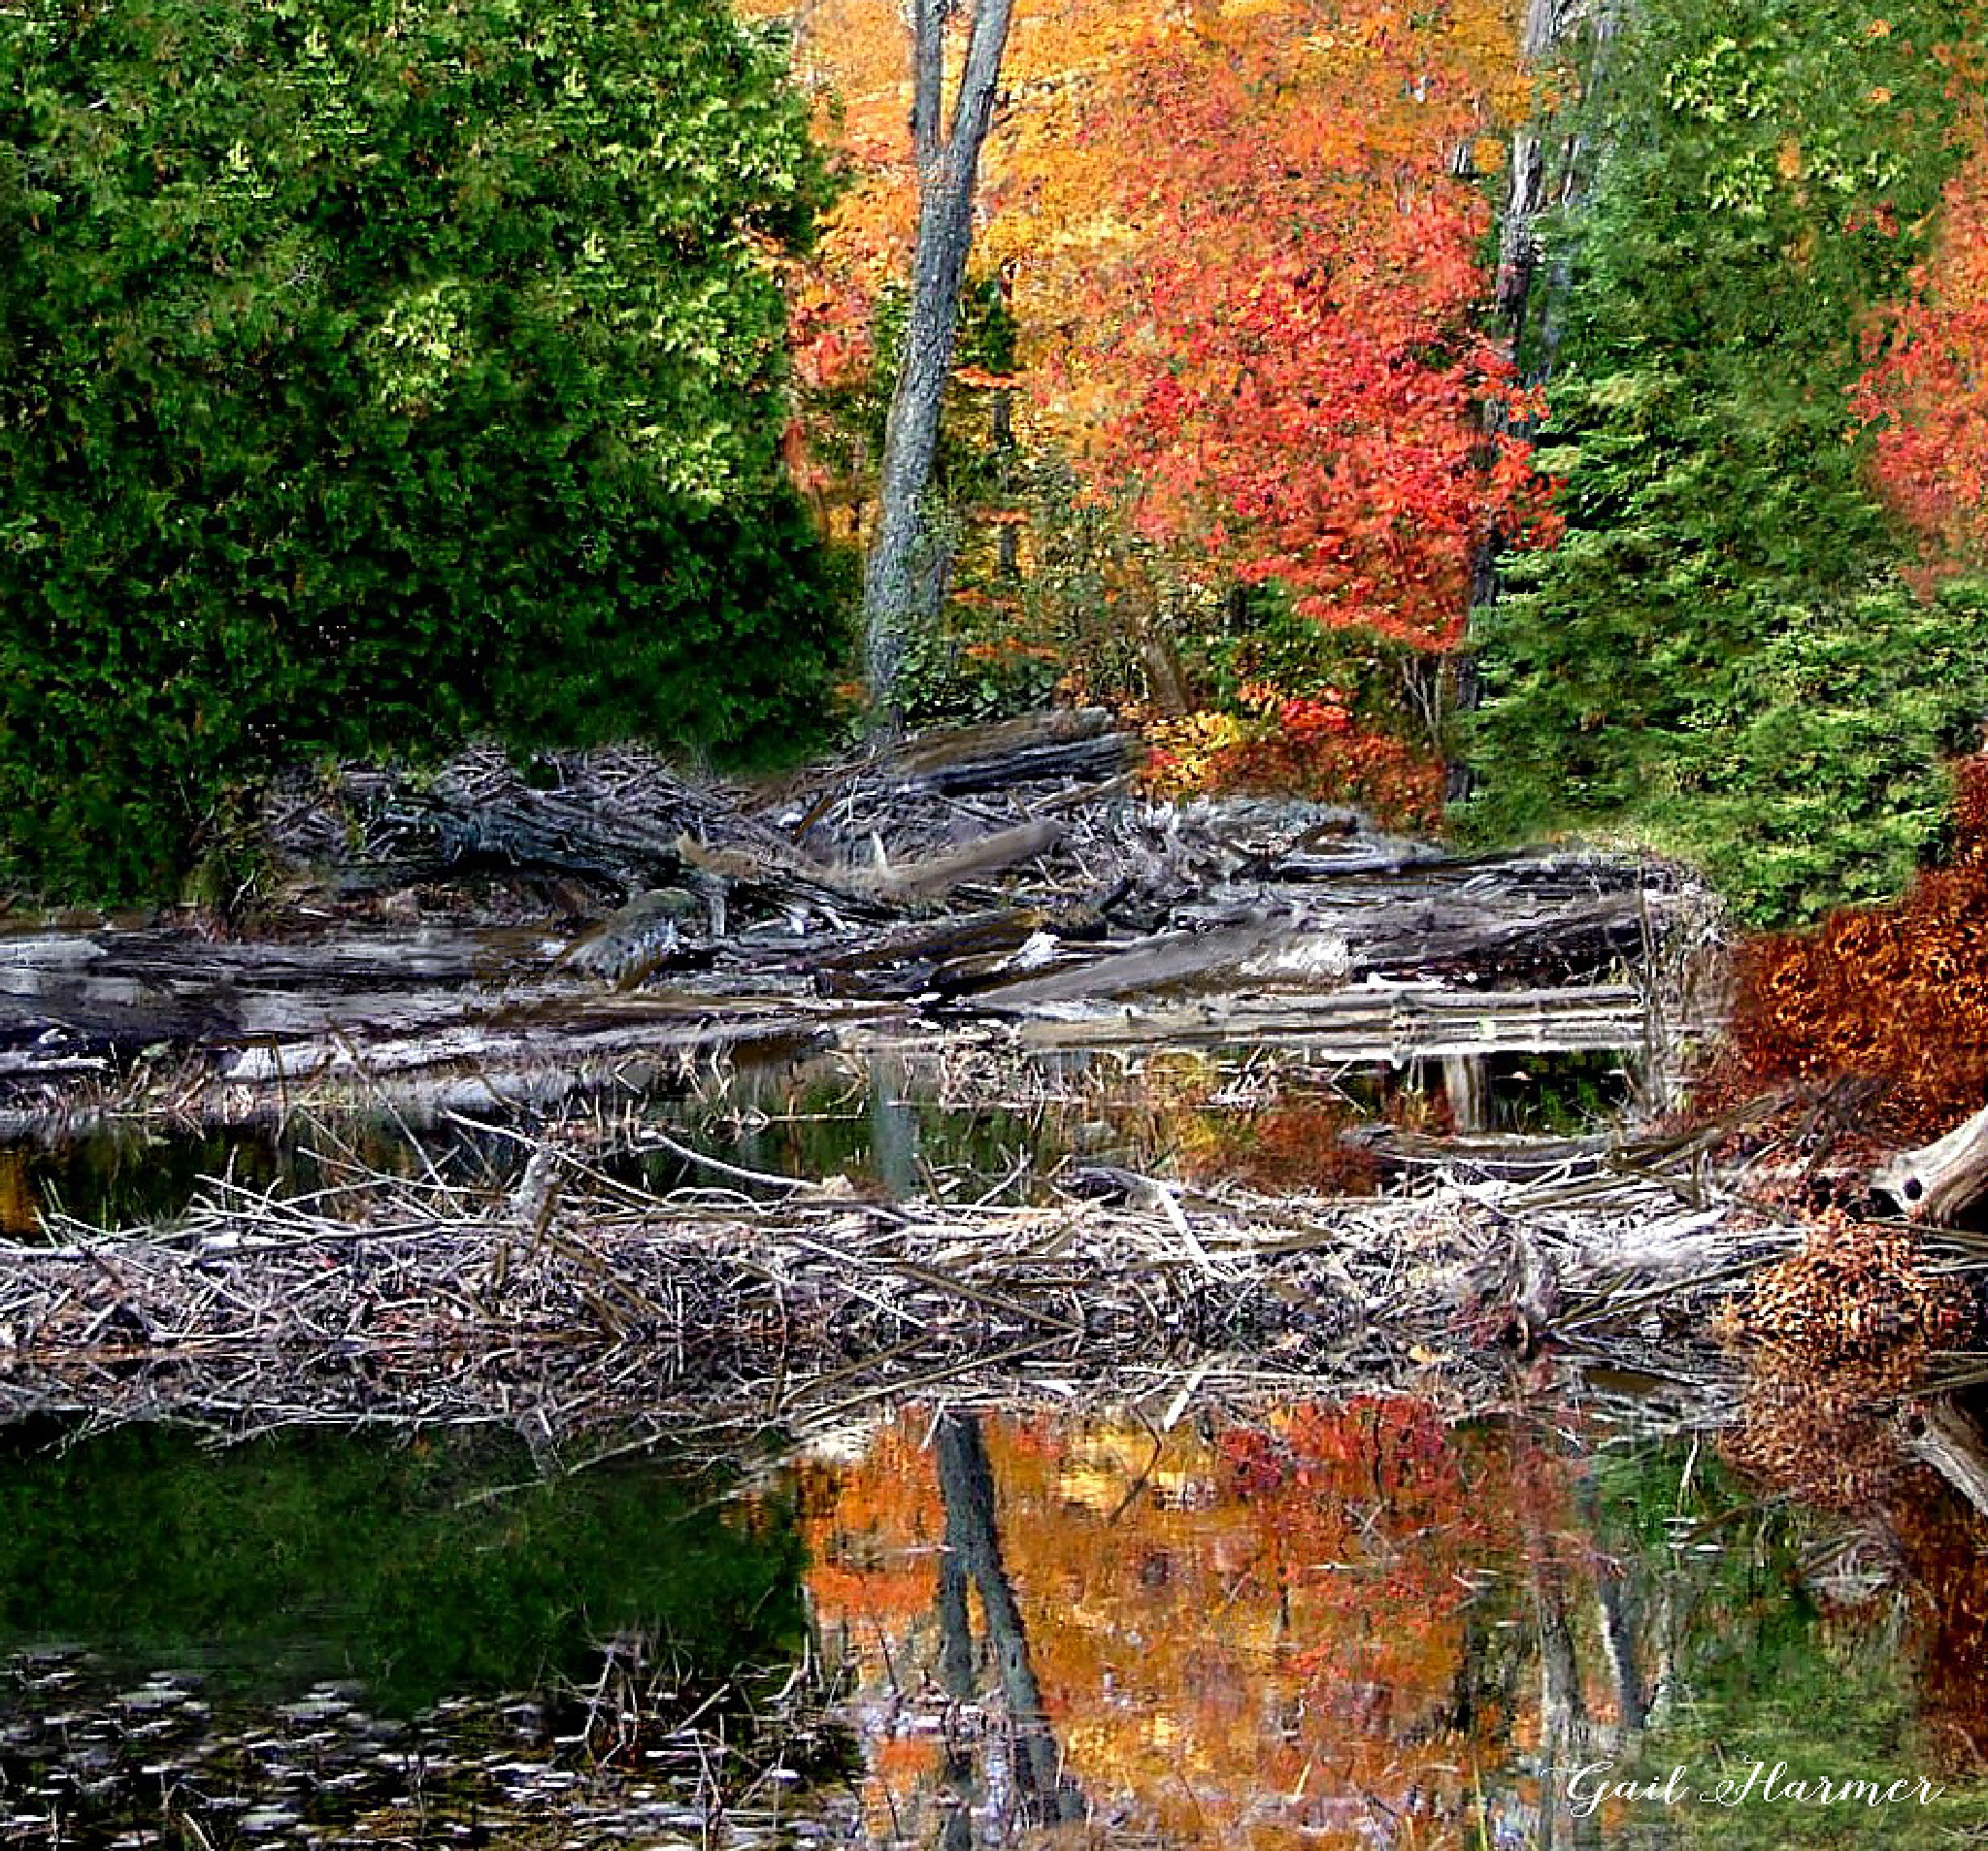 Beaver Dam - Silent Lake by GailHarmer